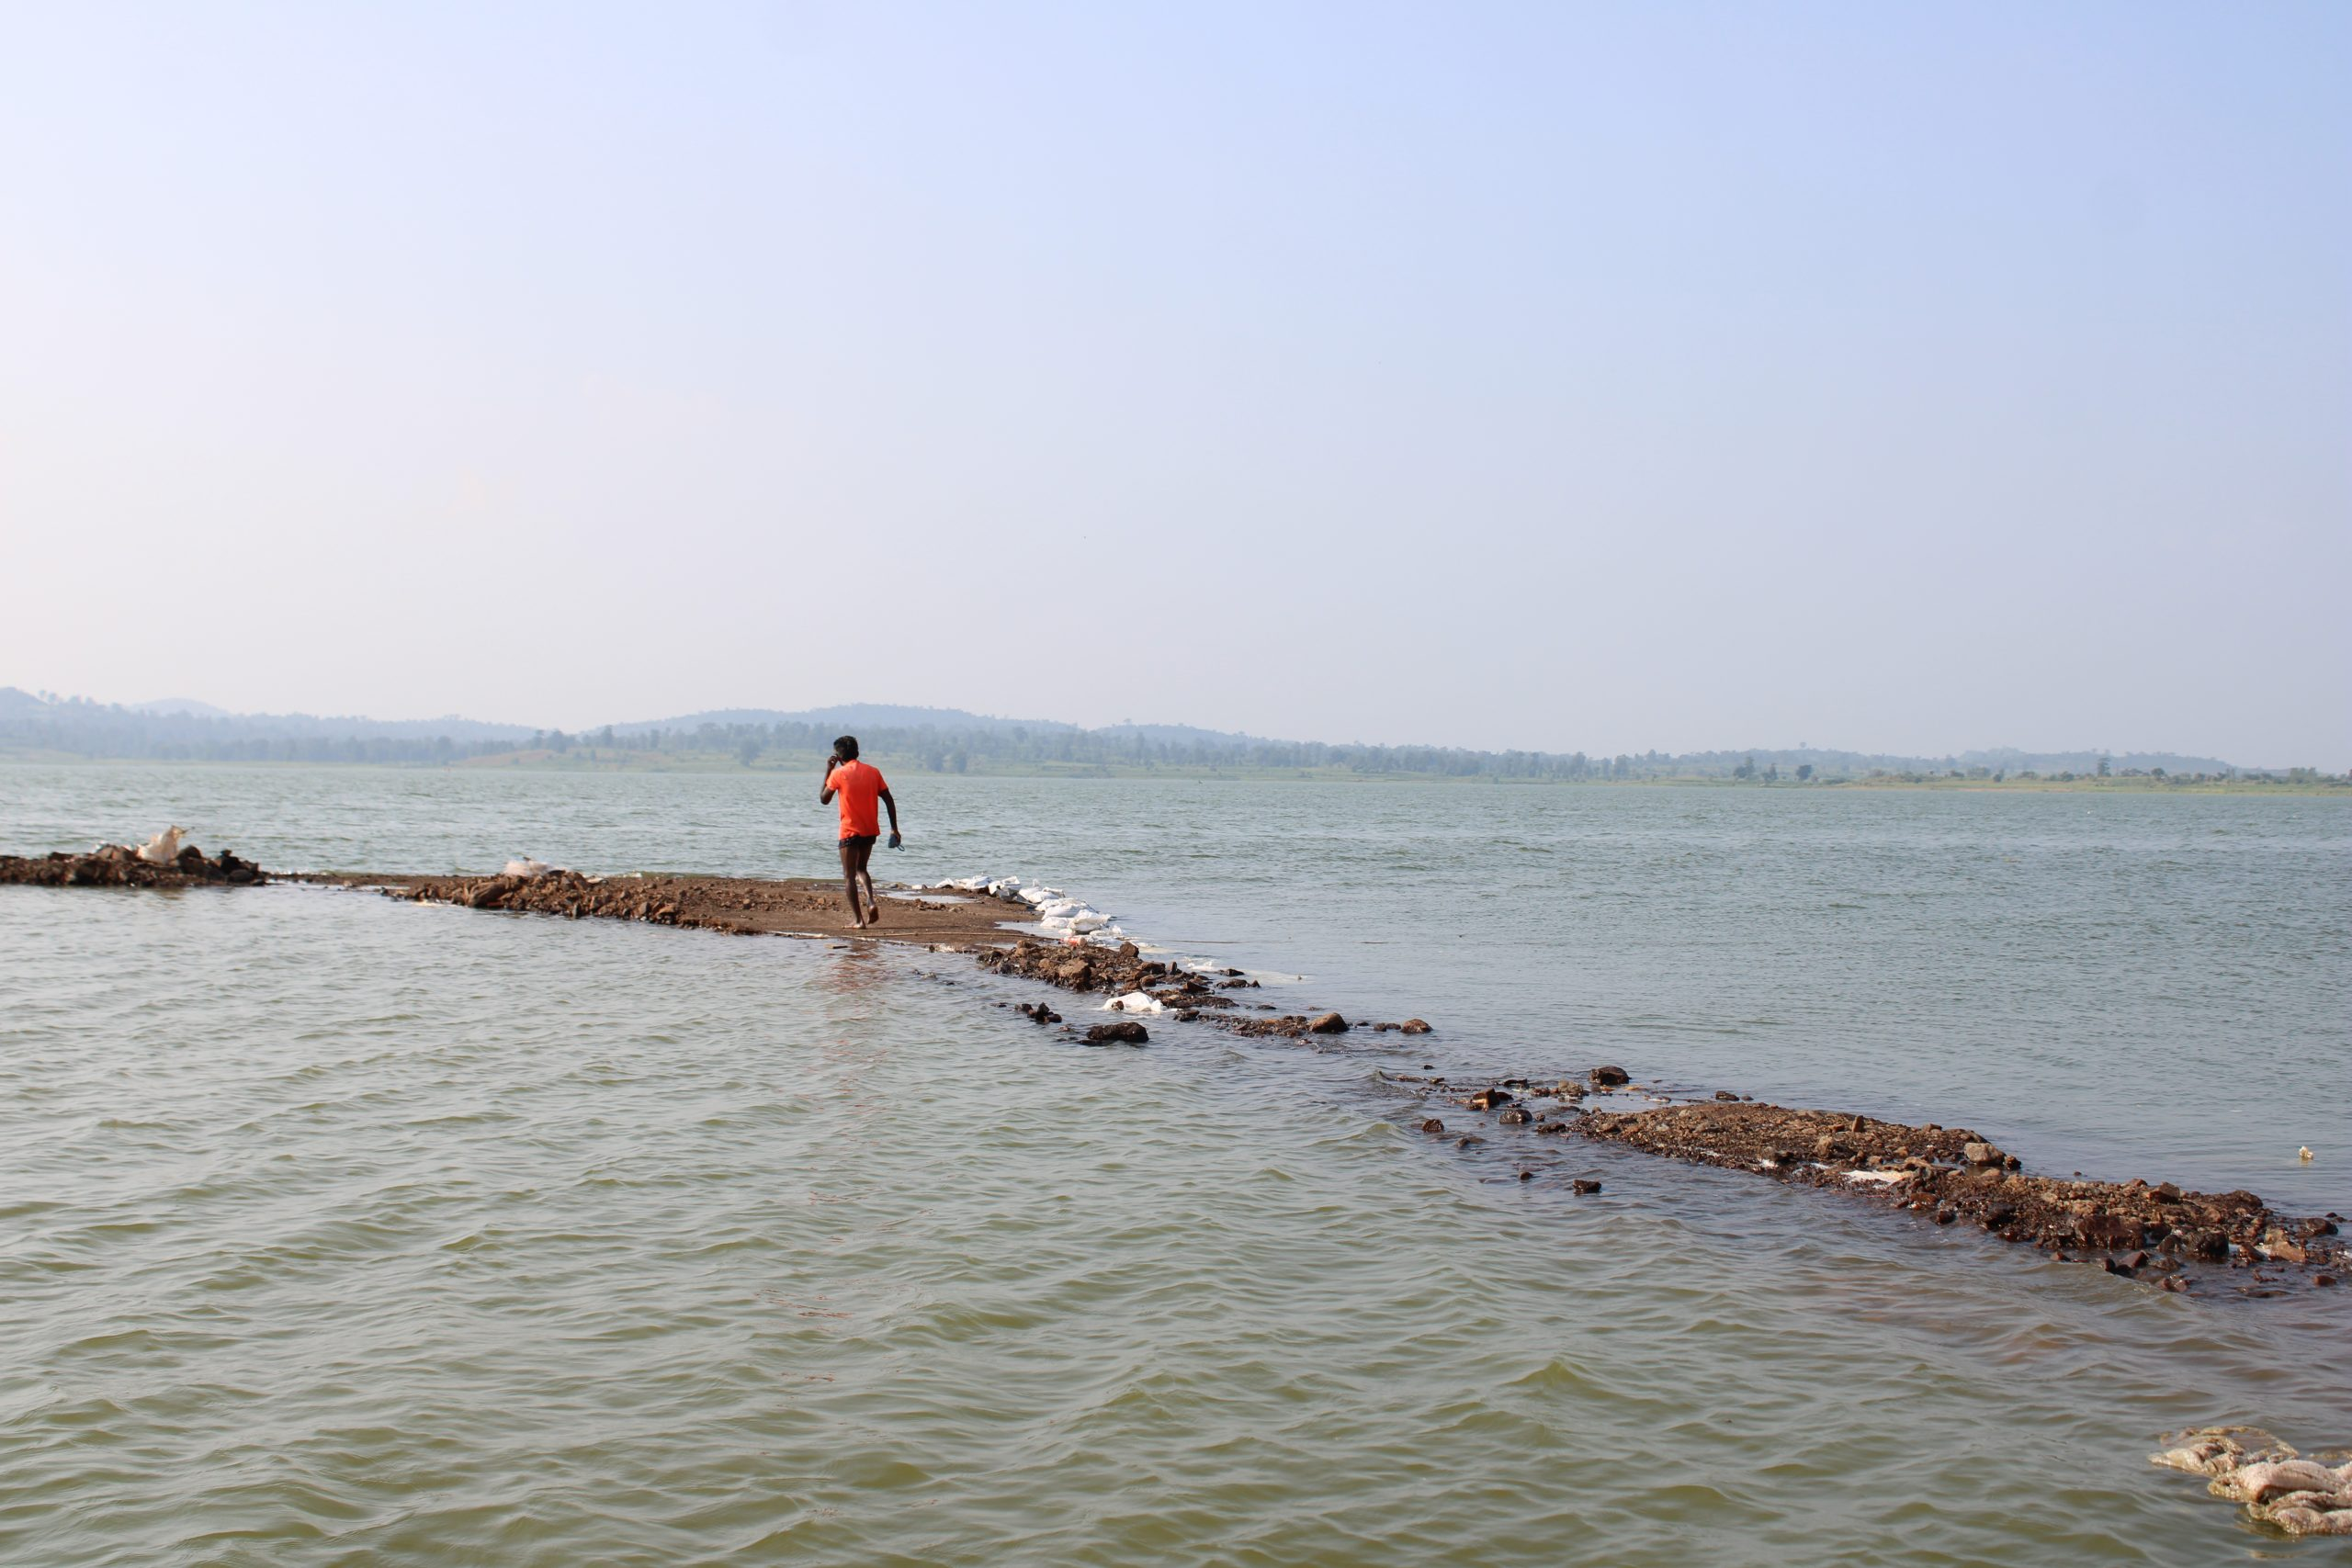 A fisherman at a beach